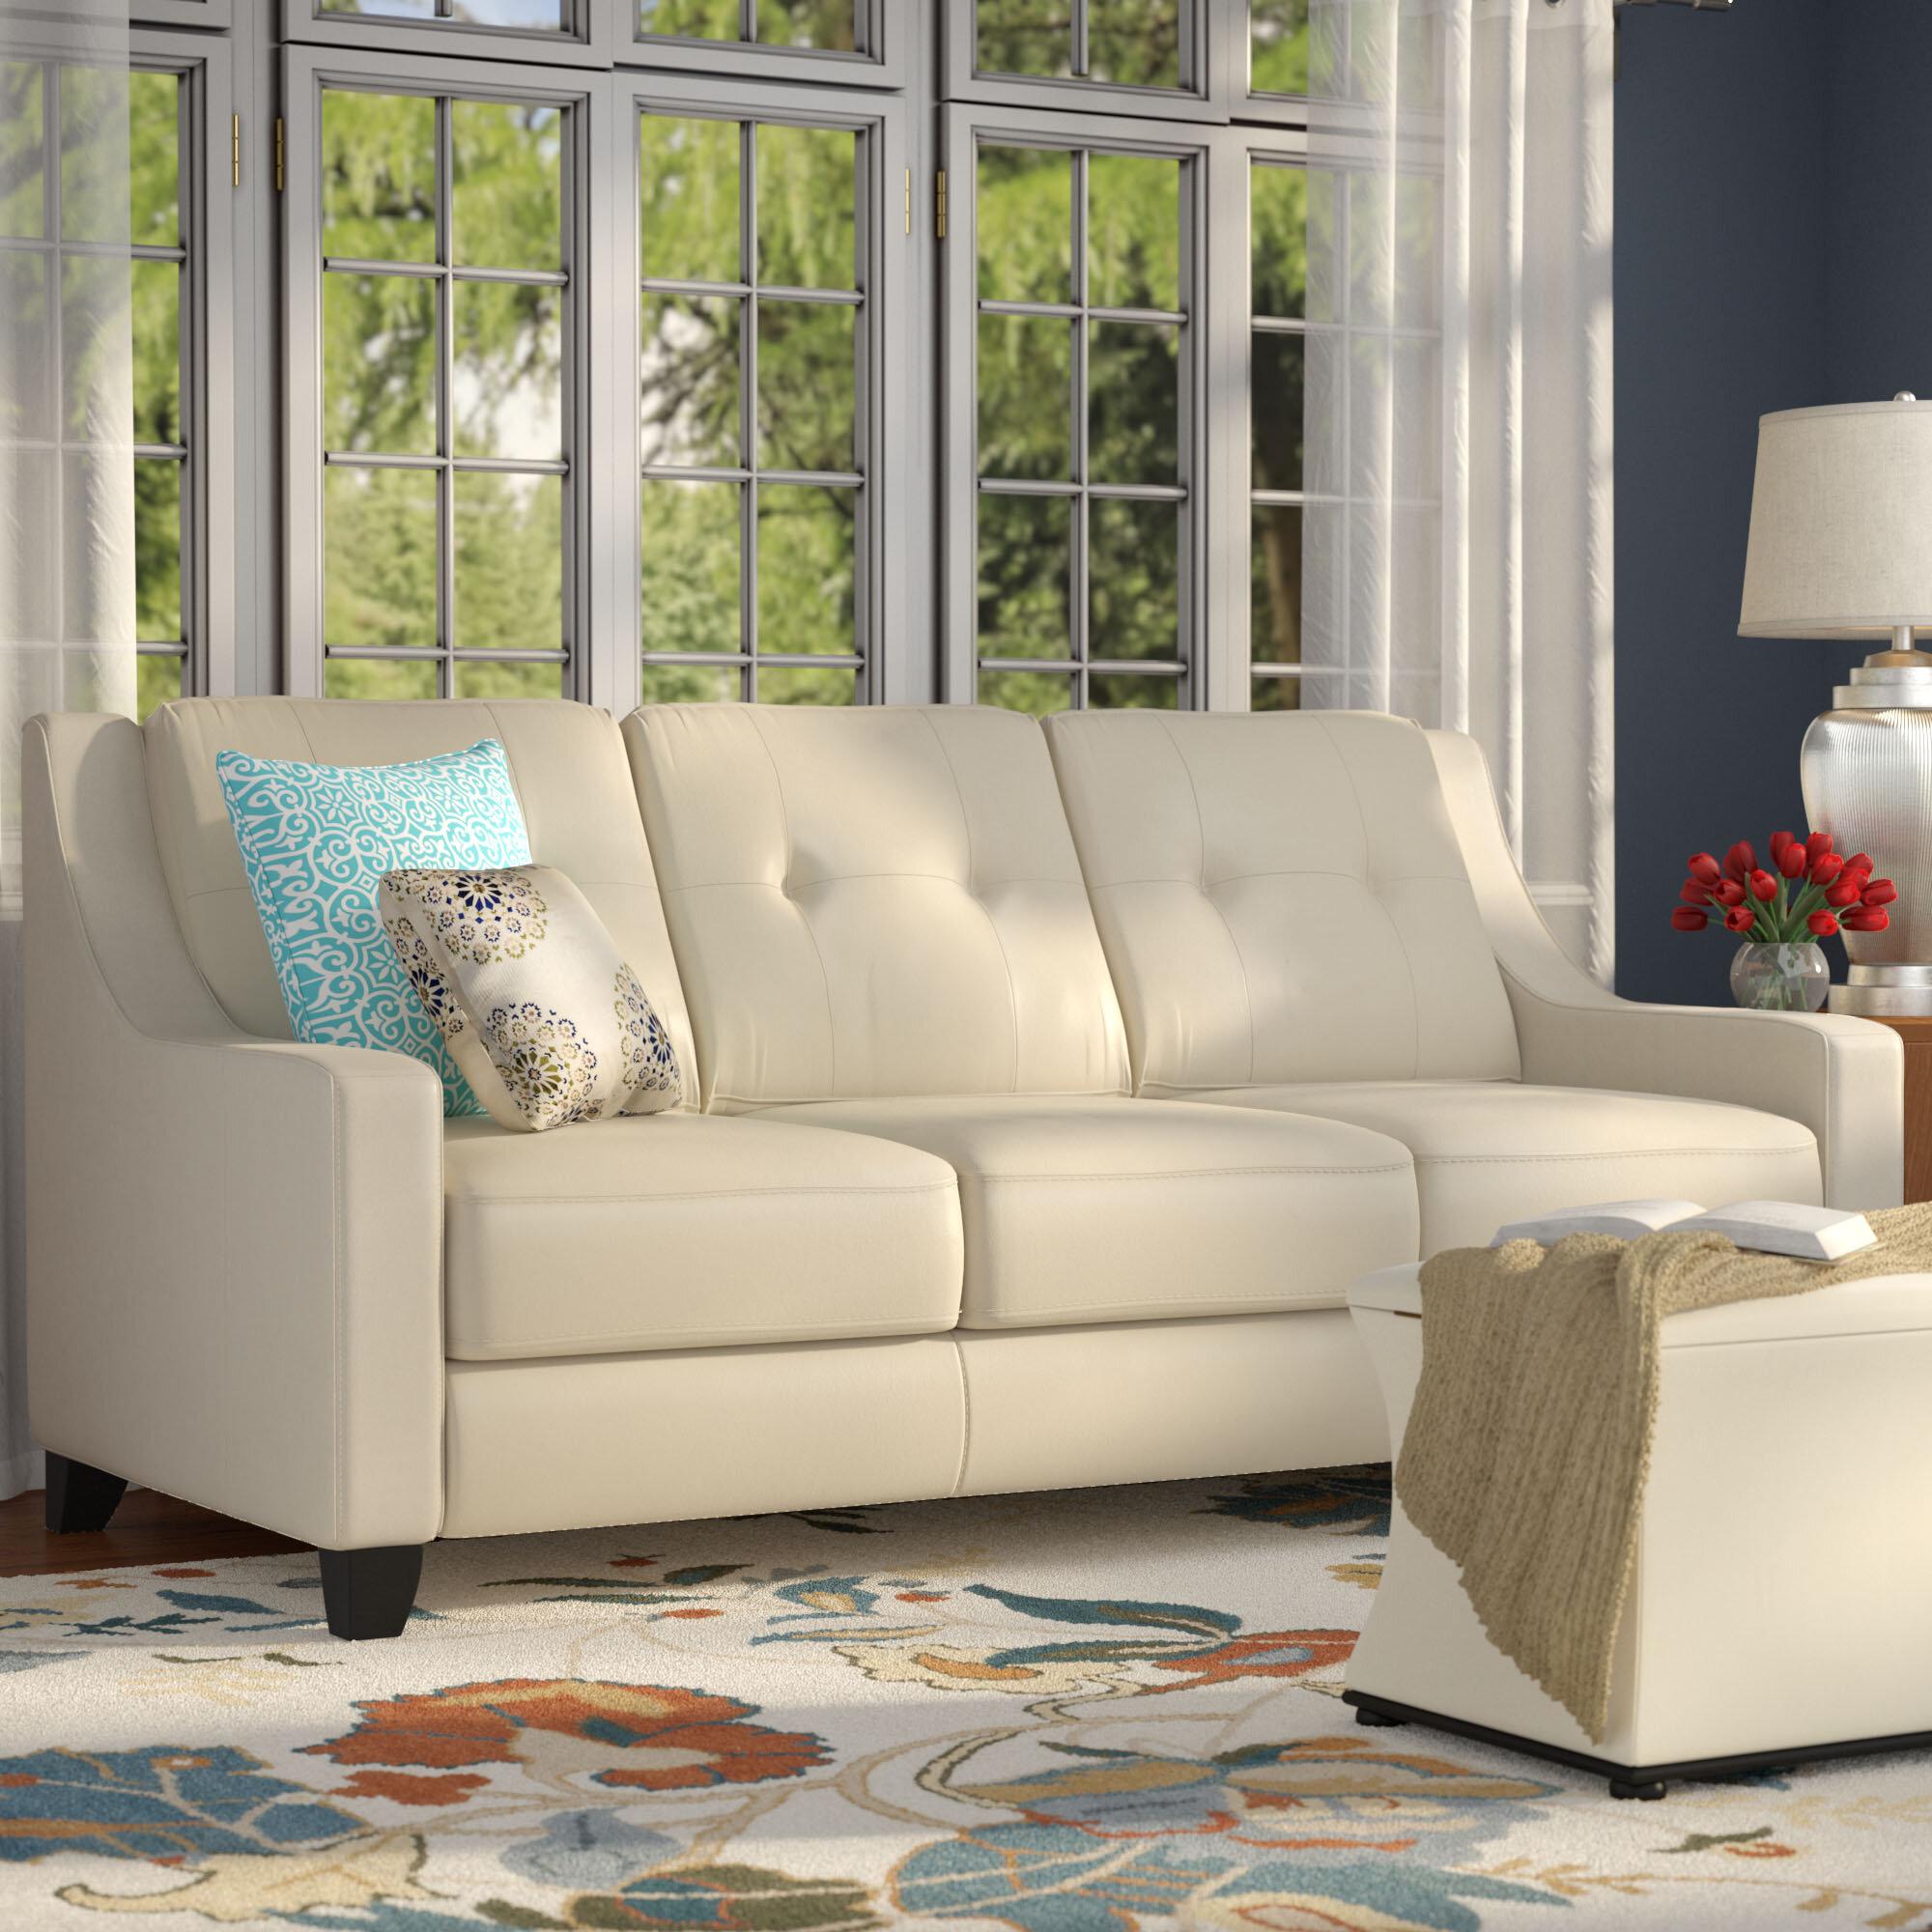 Red Barrel Studio Stouffer Leather Sofa Sleeper & Reviews | Wayfair